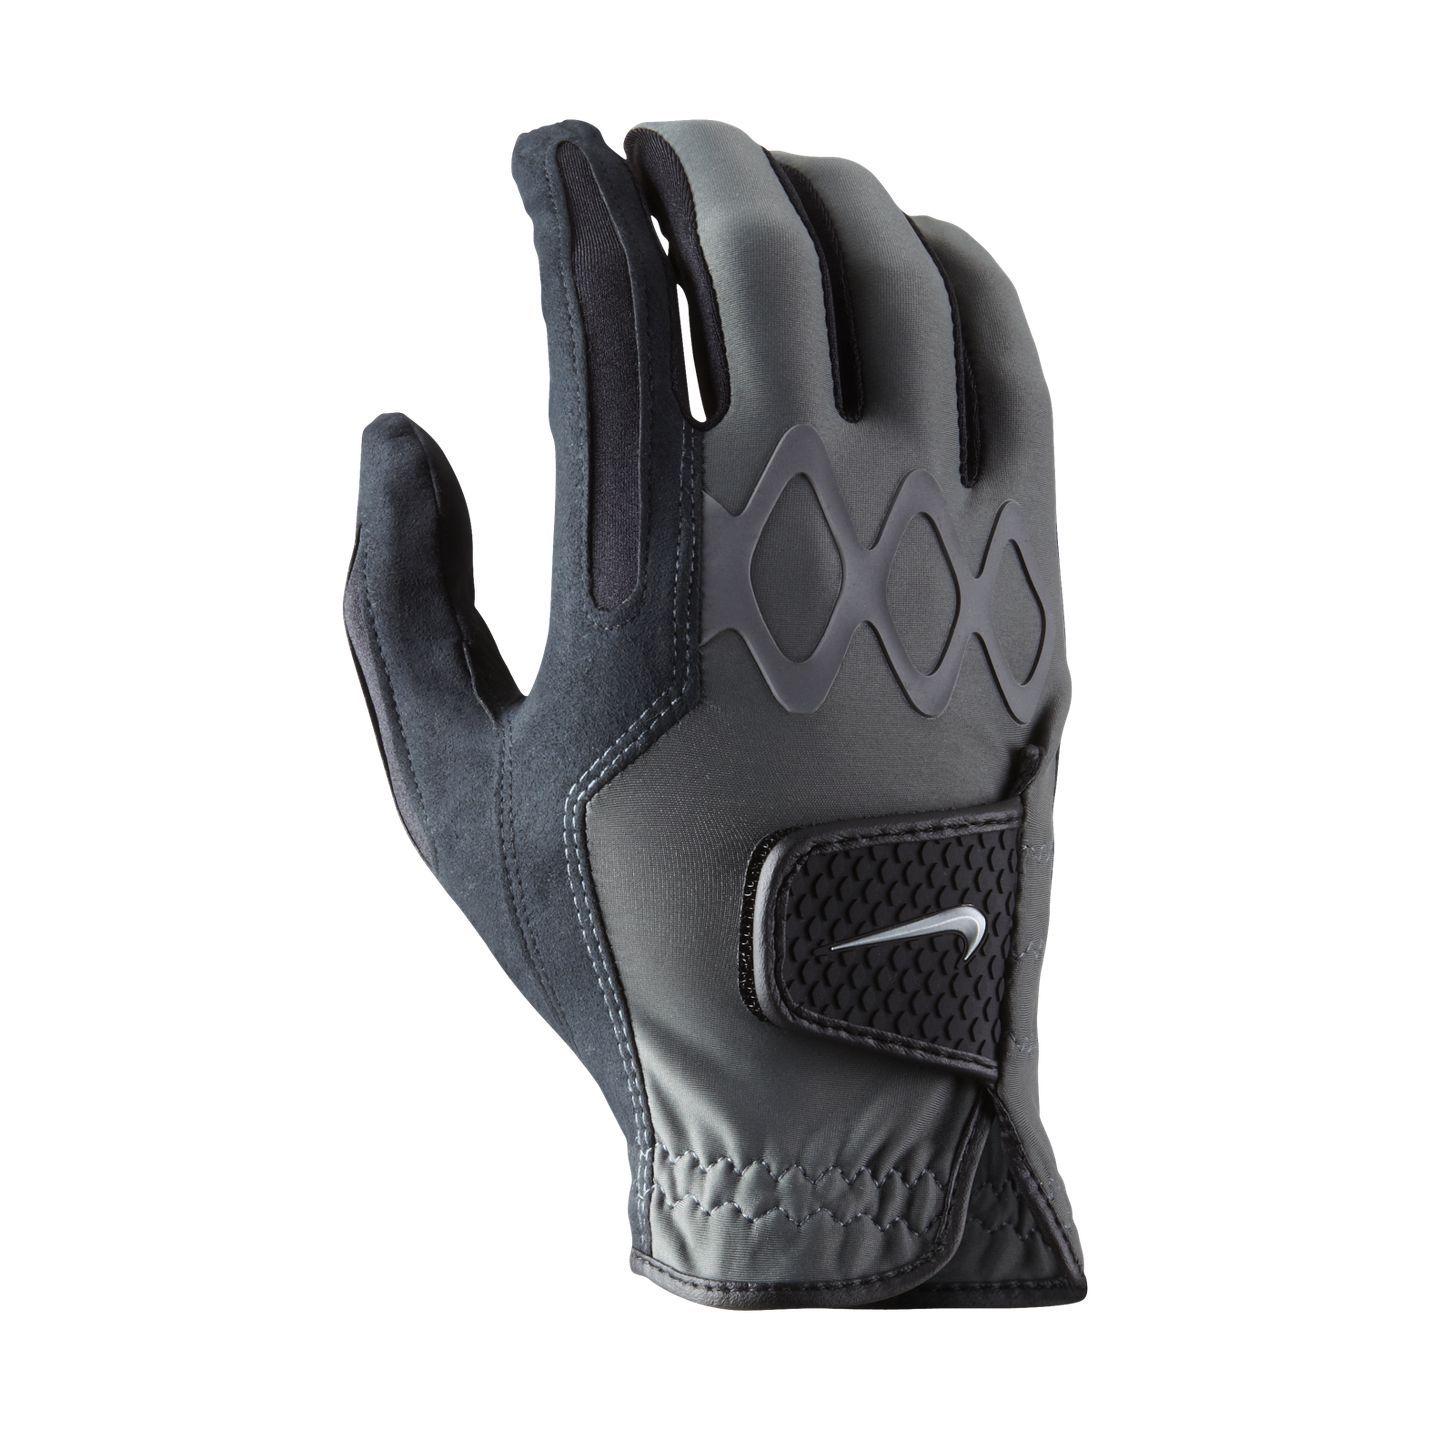 Nike Store Nike All Weather Ii Regular Gloves Golf 2 Design